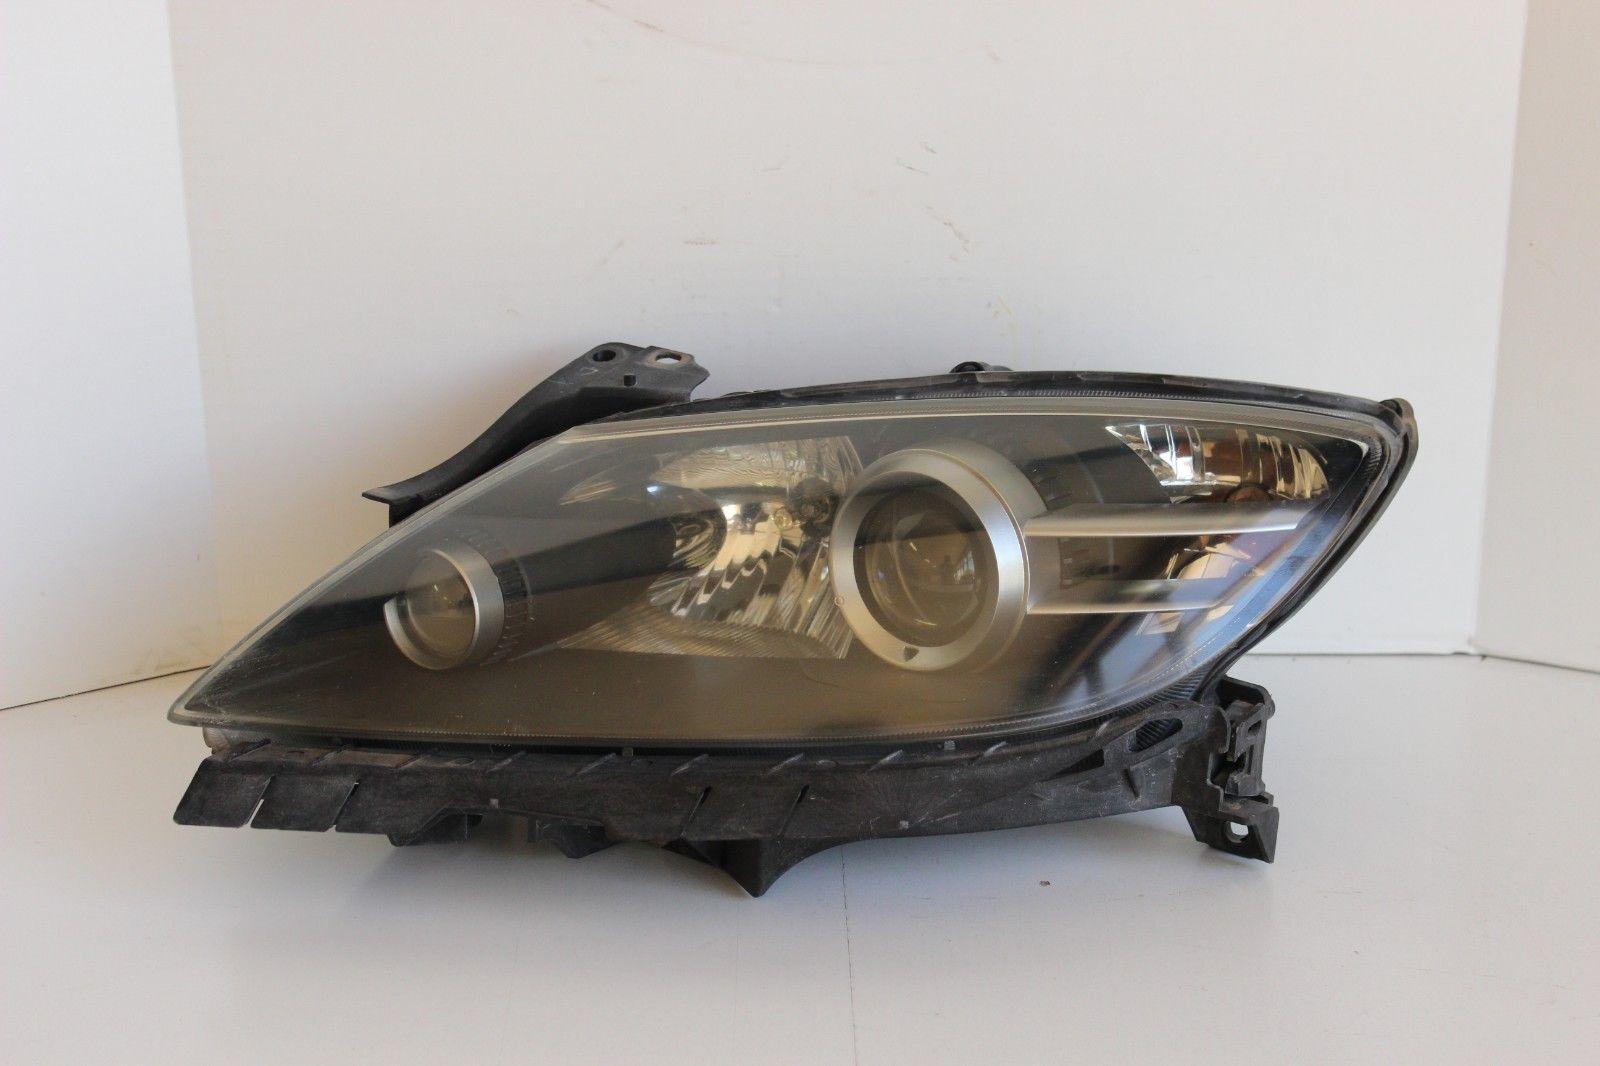 2004 2008 mazda rx8 rx 8 lh left driver side halogen headlight